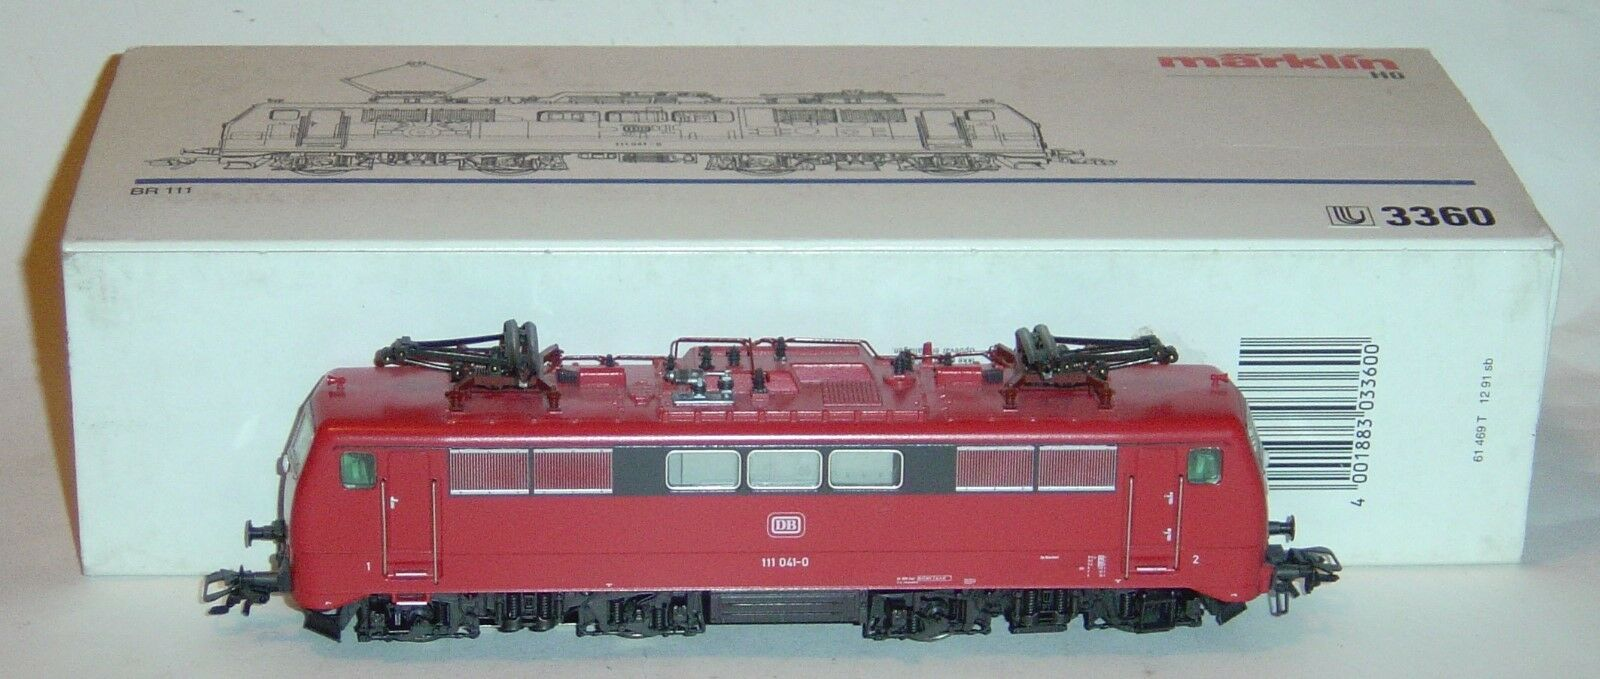 Marklin ho, electric locomotive Excellent br111 DB ref.3360 5-pole digital